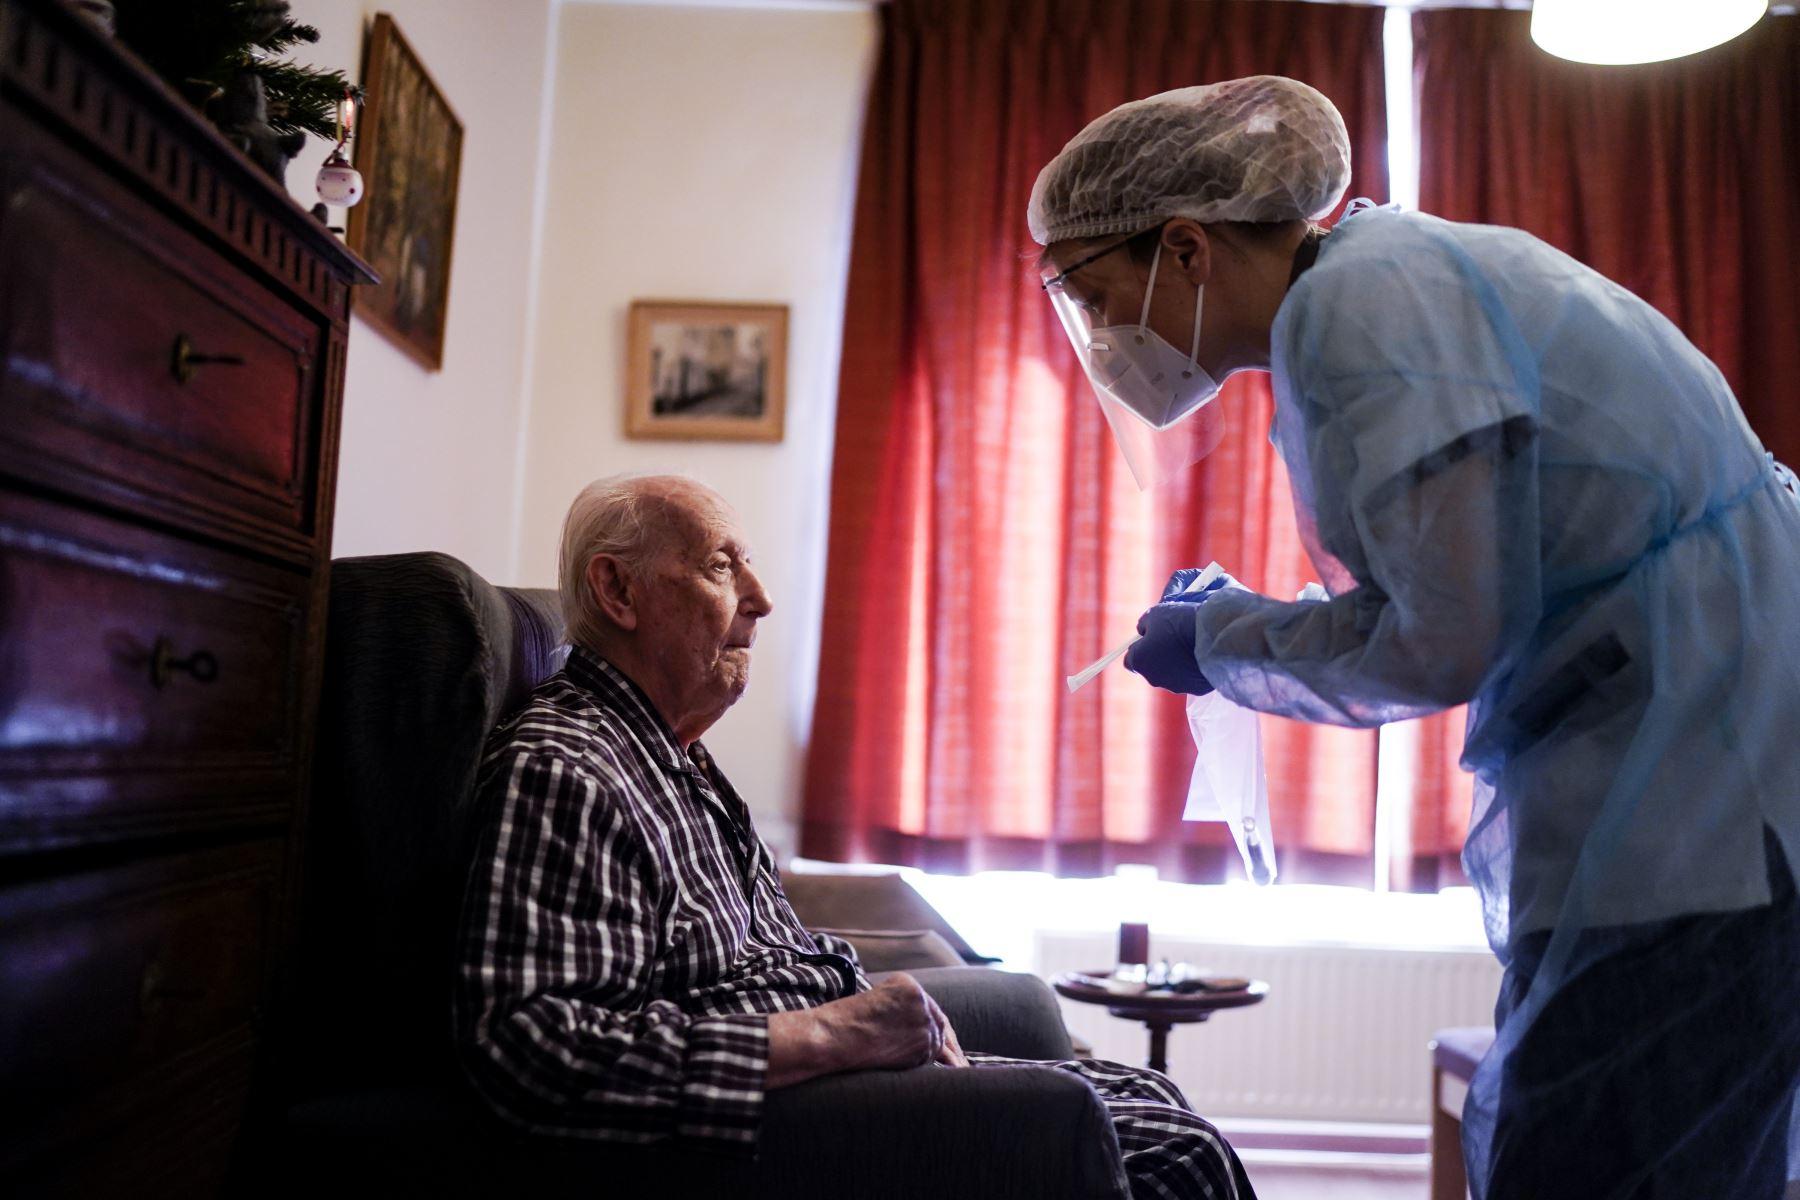 Expertos en salud mental indican que durante la pandemia el número se casos del síndrome del cuidador creció en 50% . Foto: ANDINA/Jhonel Rodríguez Robles